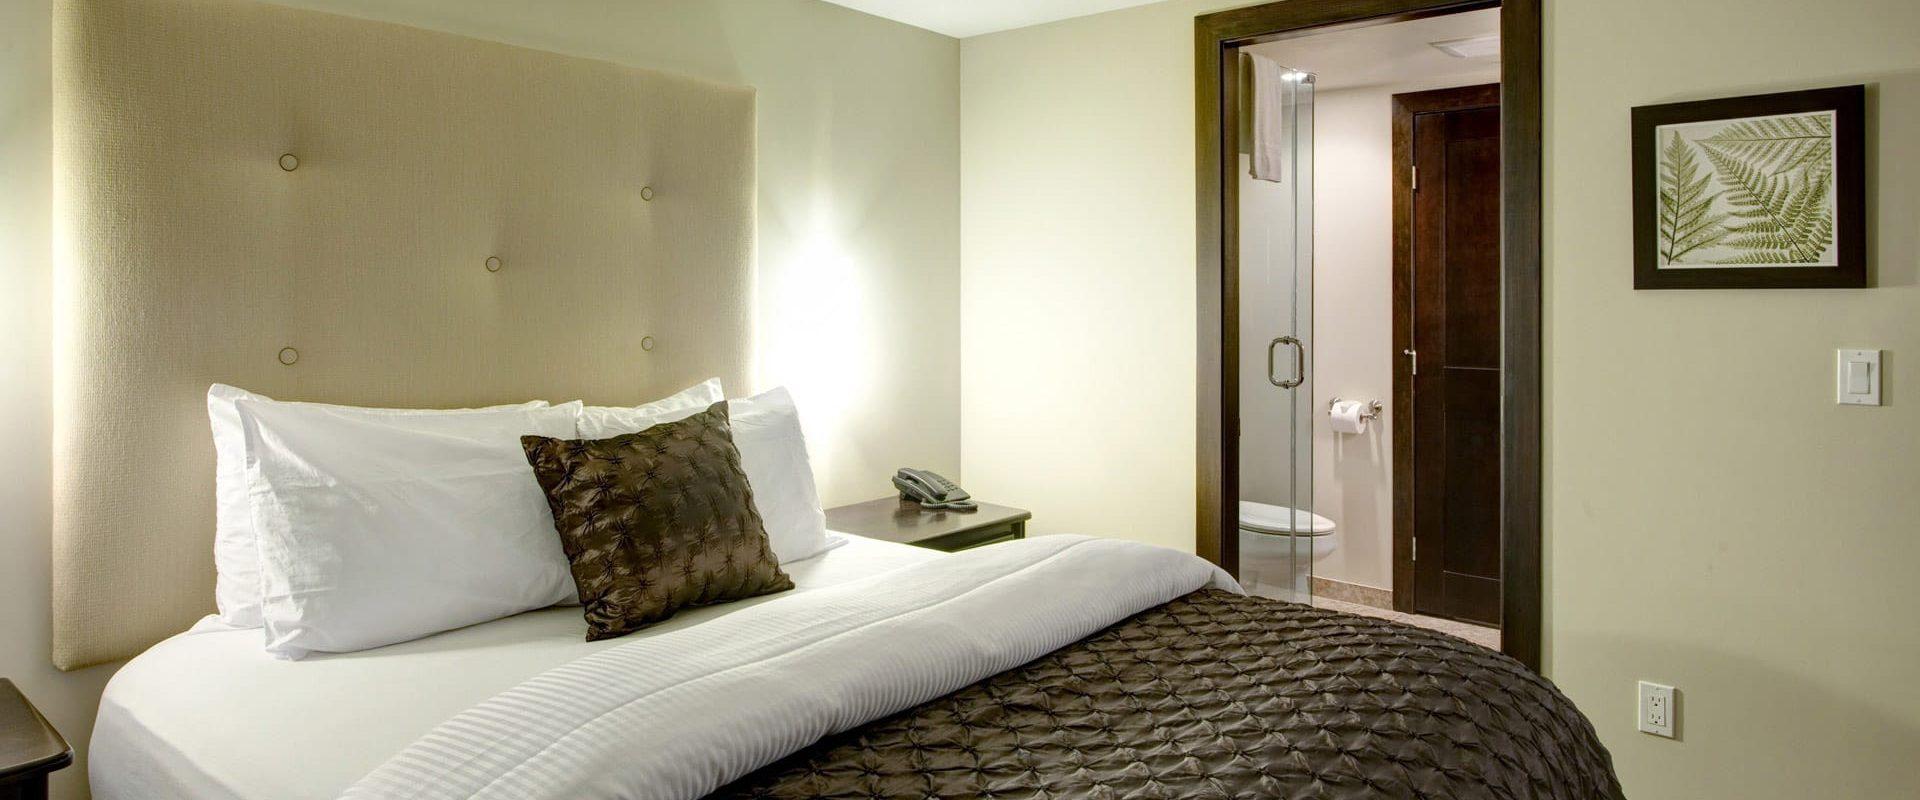 1-bedroom-suites-img